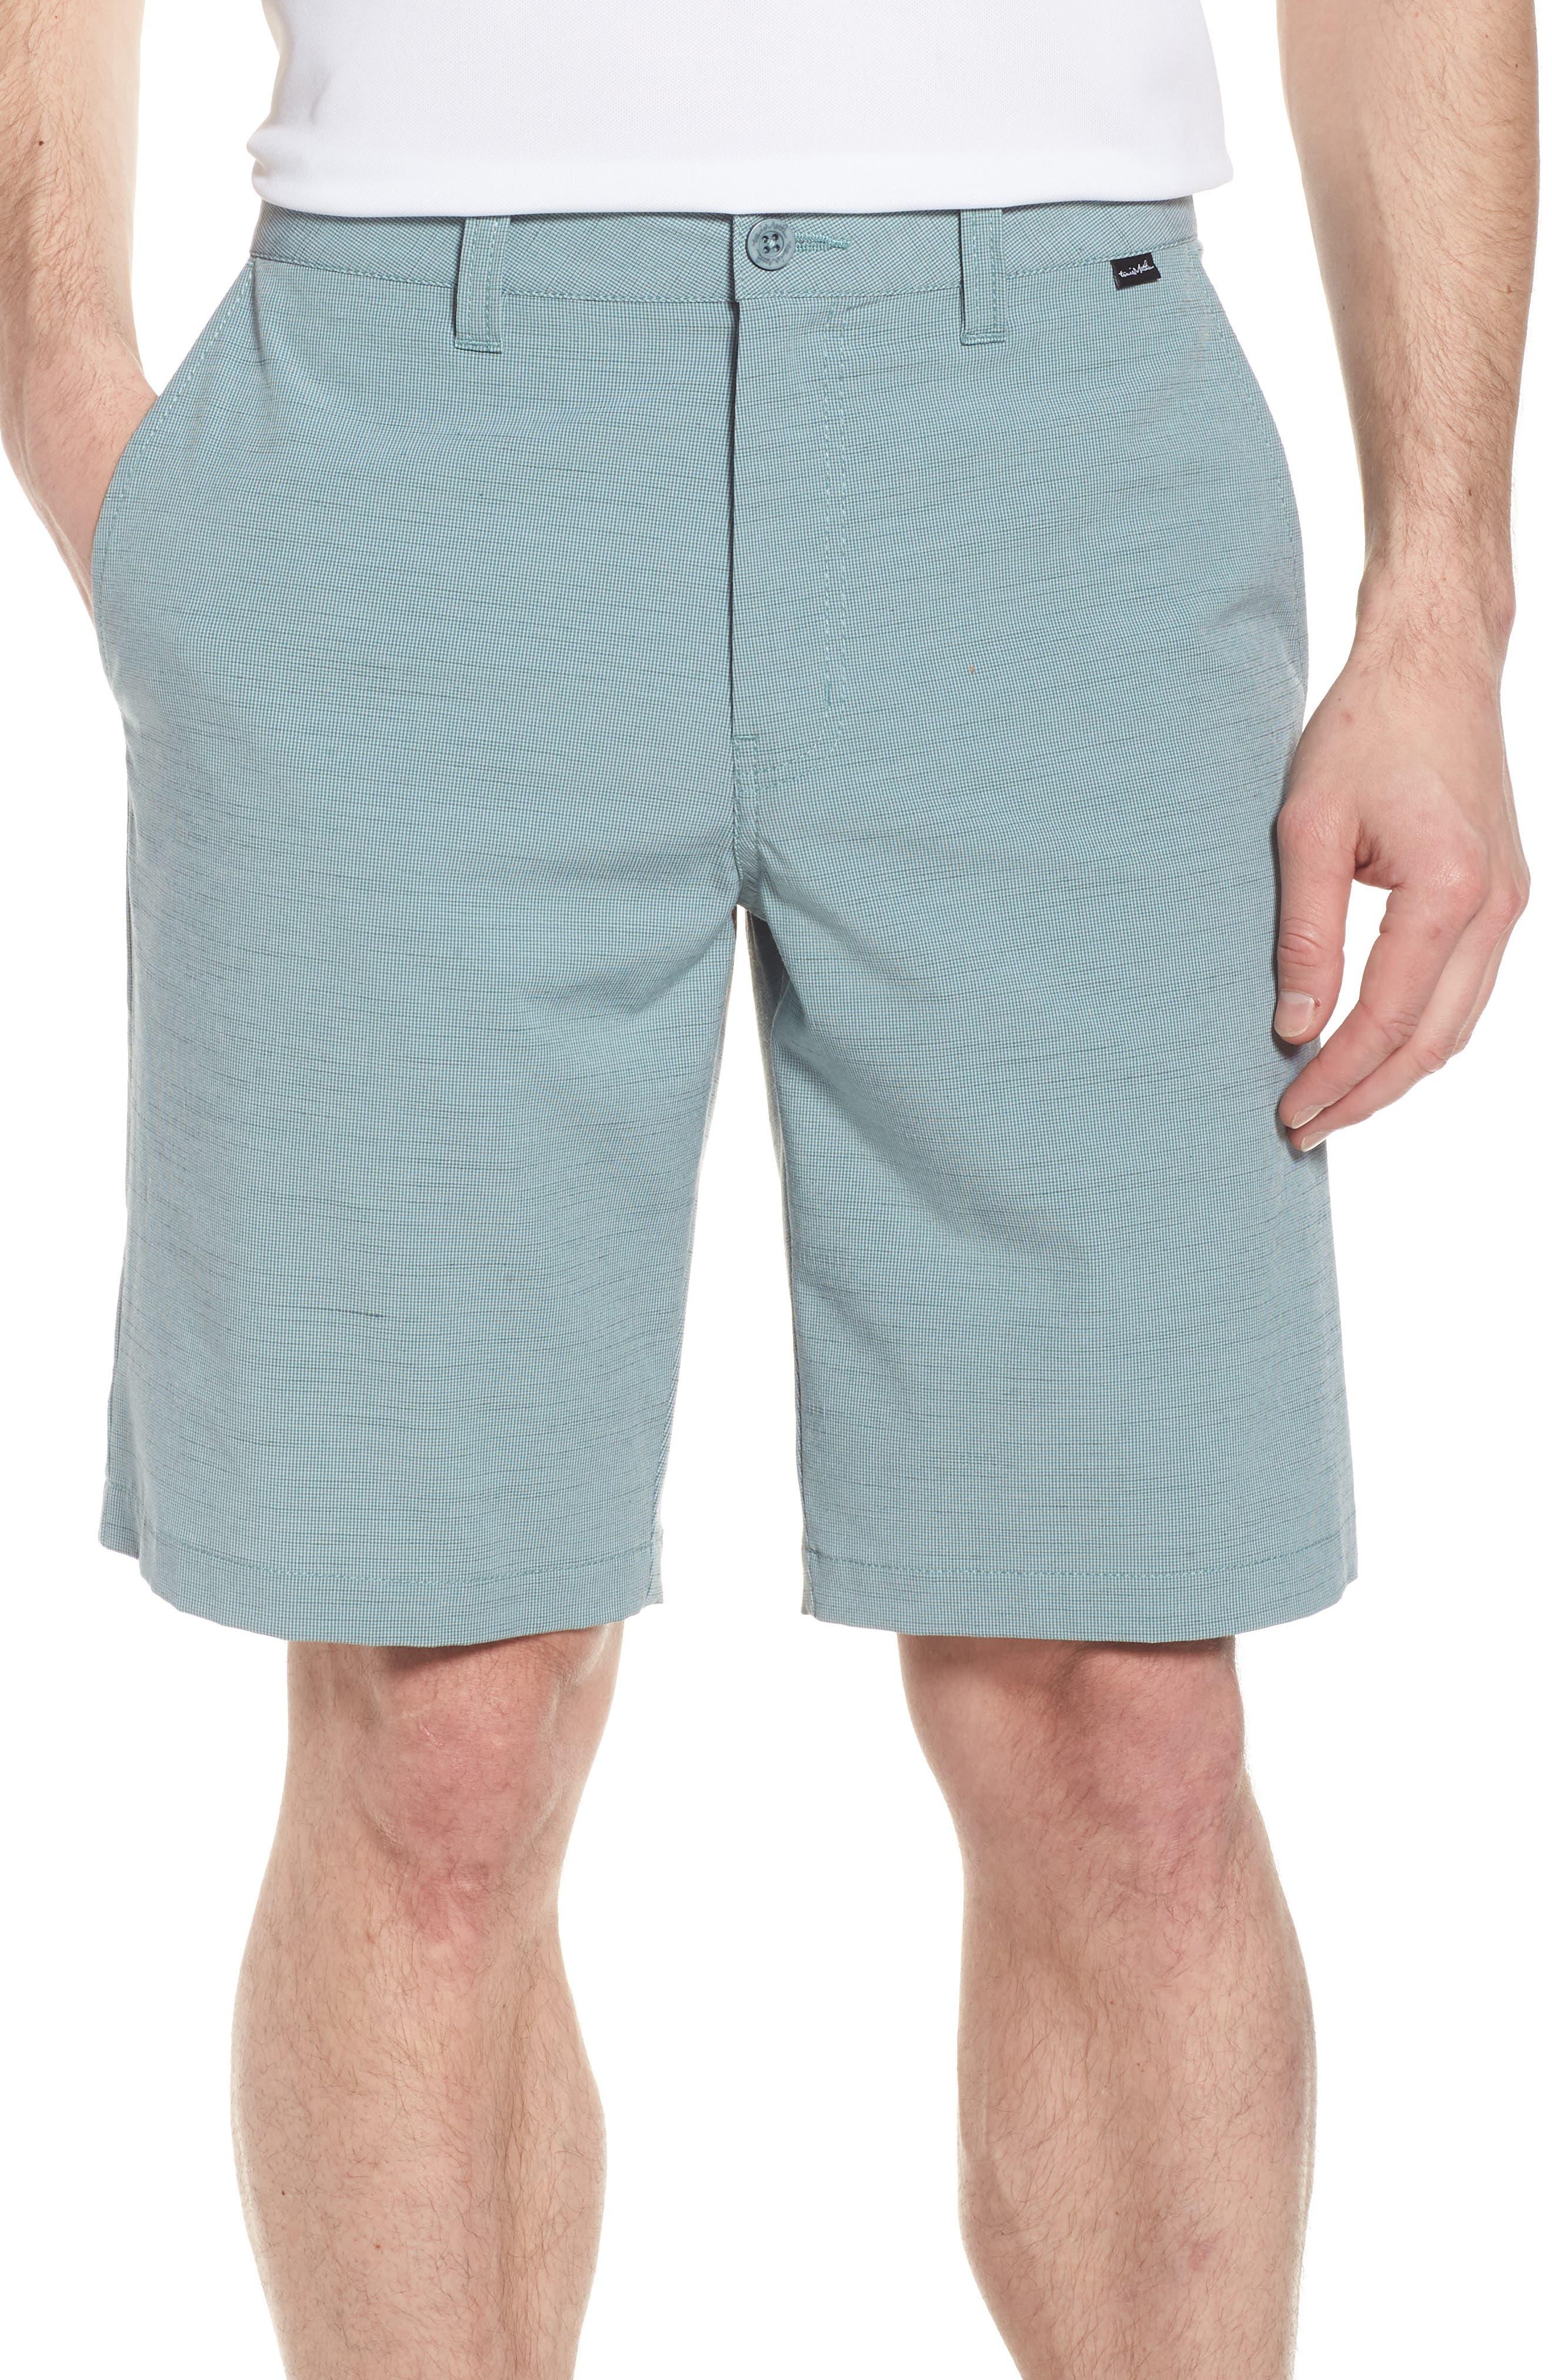 Tulum Stretch Shorts,                             Main thumbnail 1, color,                             Canton